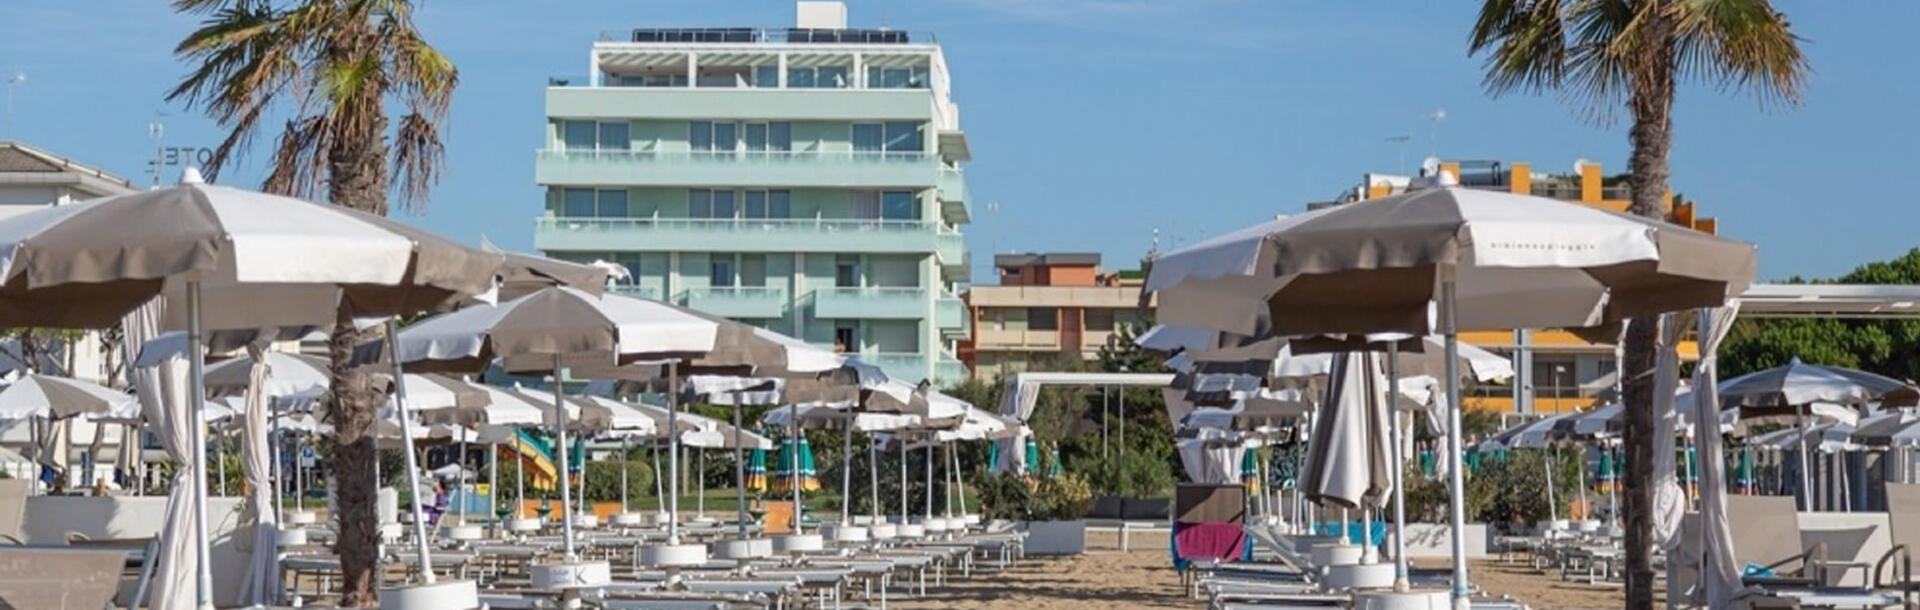 hotel-montecarlo pl bibione-wydarzenia 013